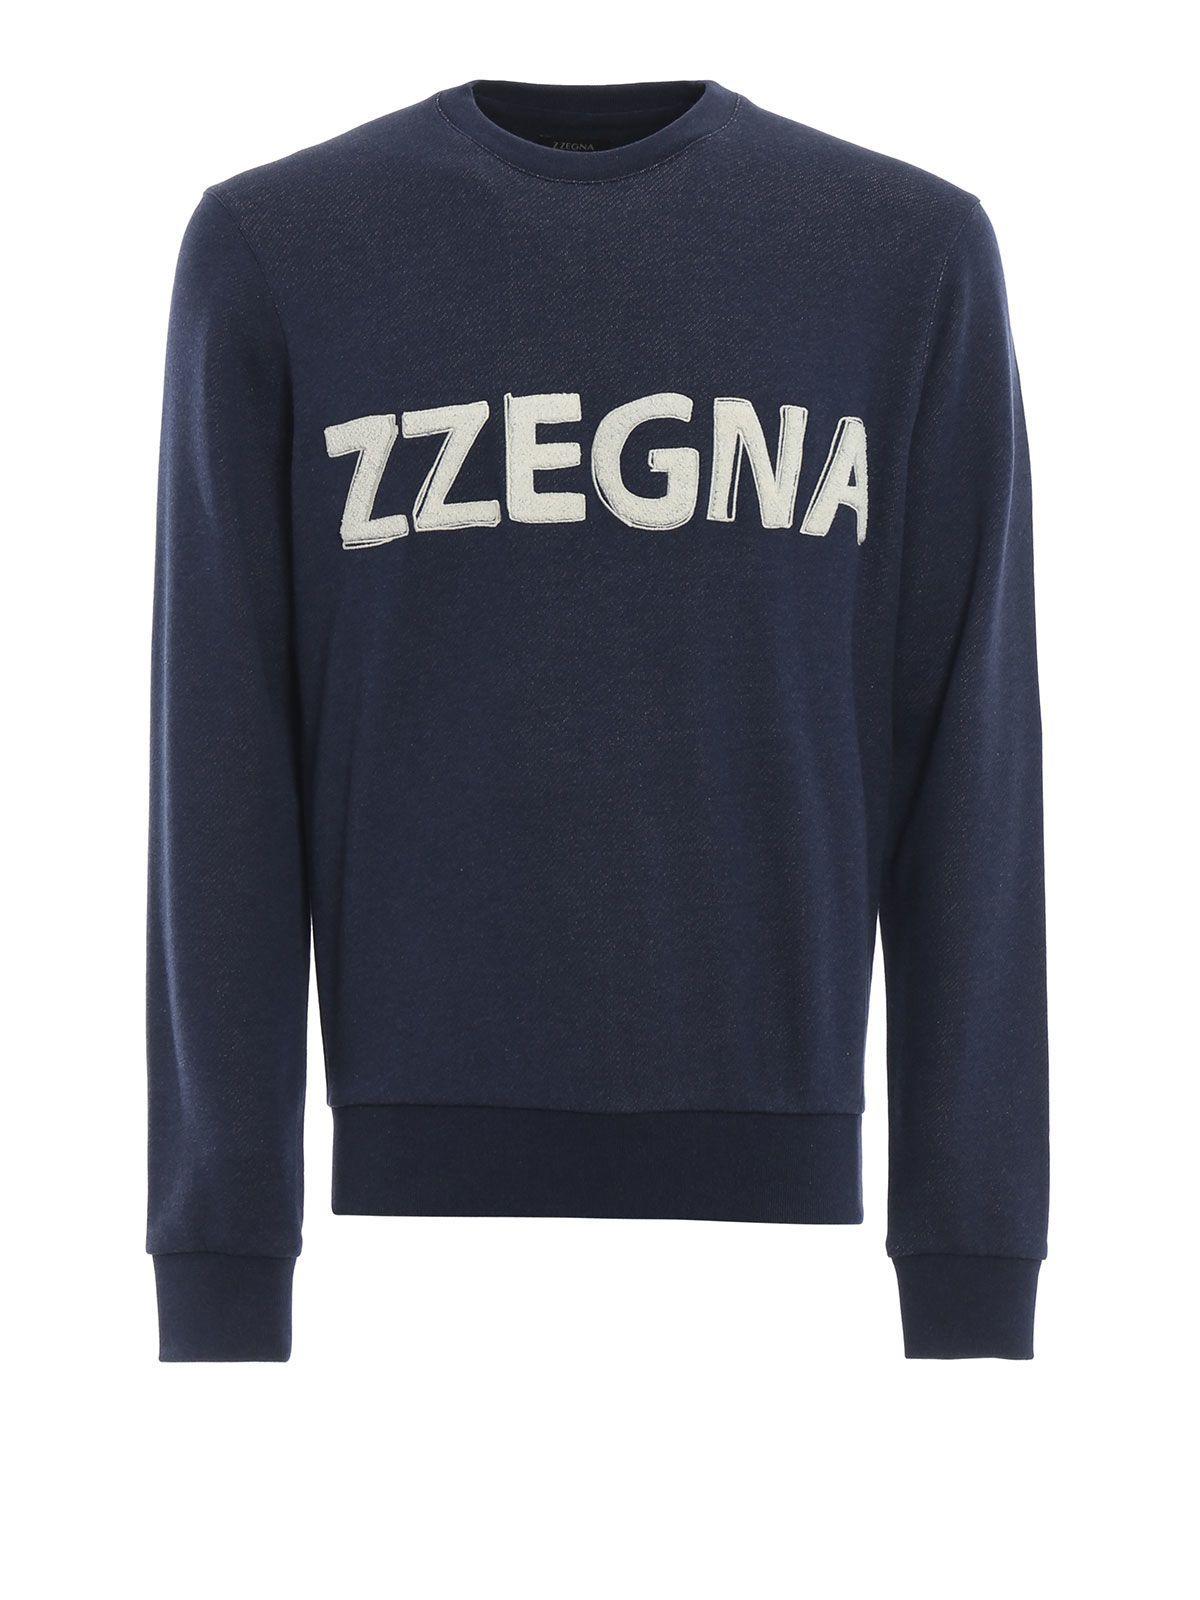 Z Zegna Logo Sweatshirt